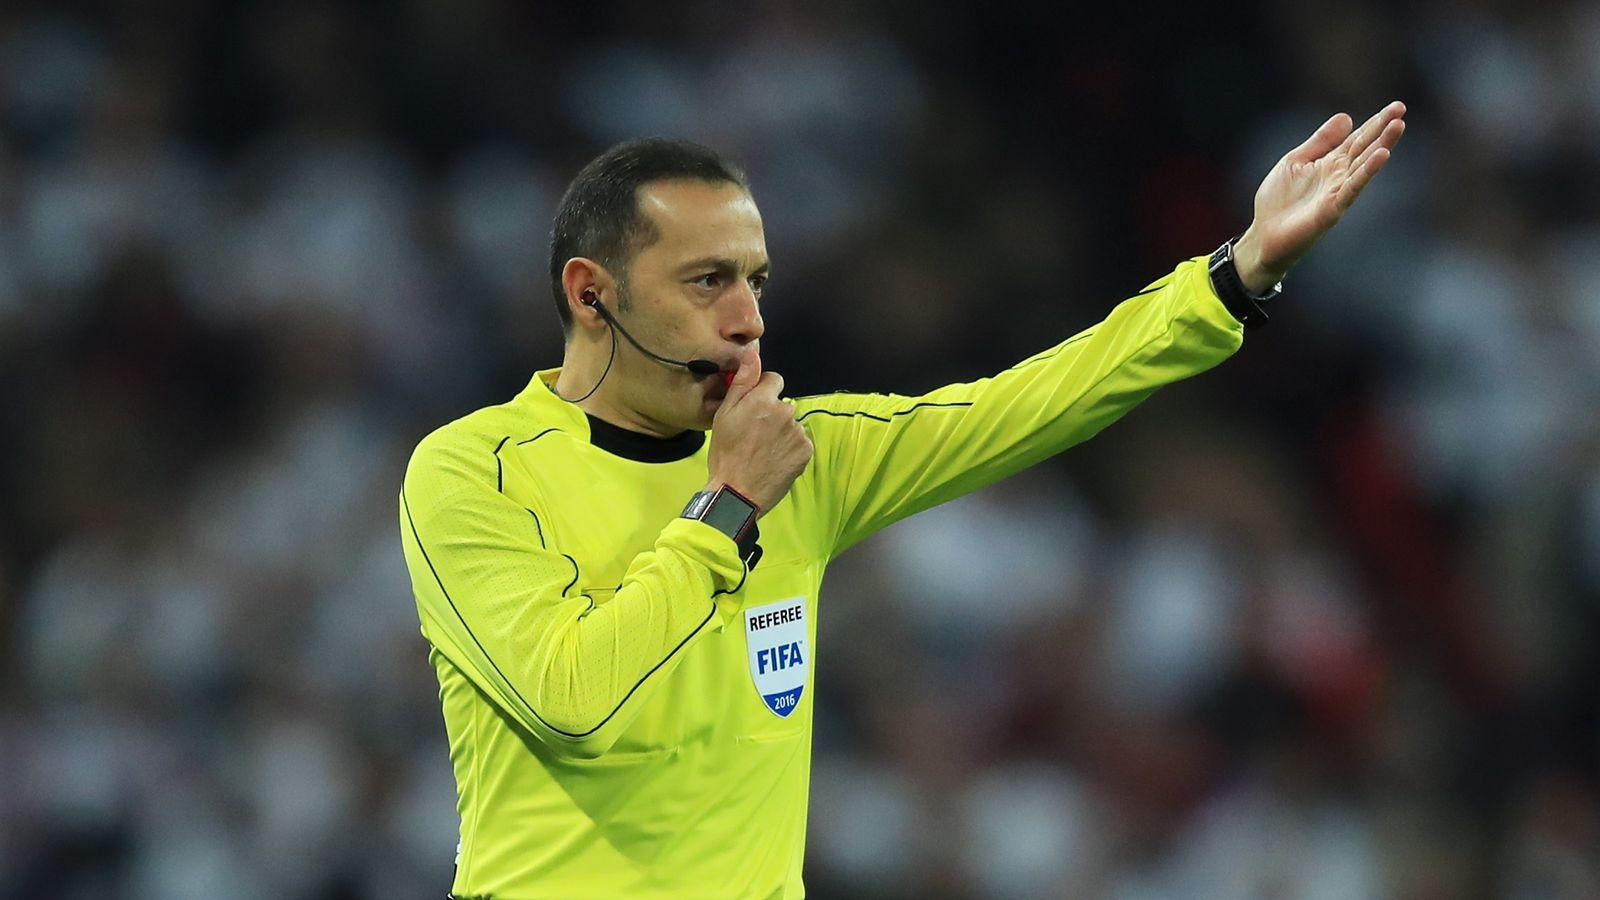 Referee-whi